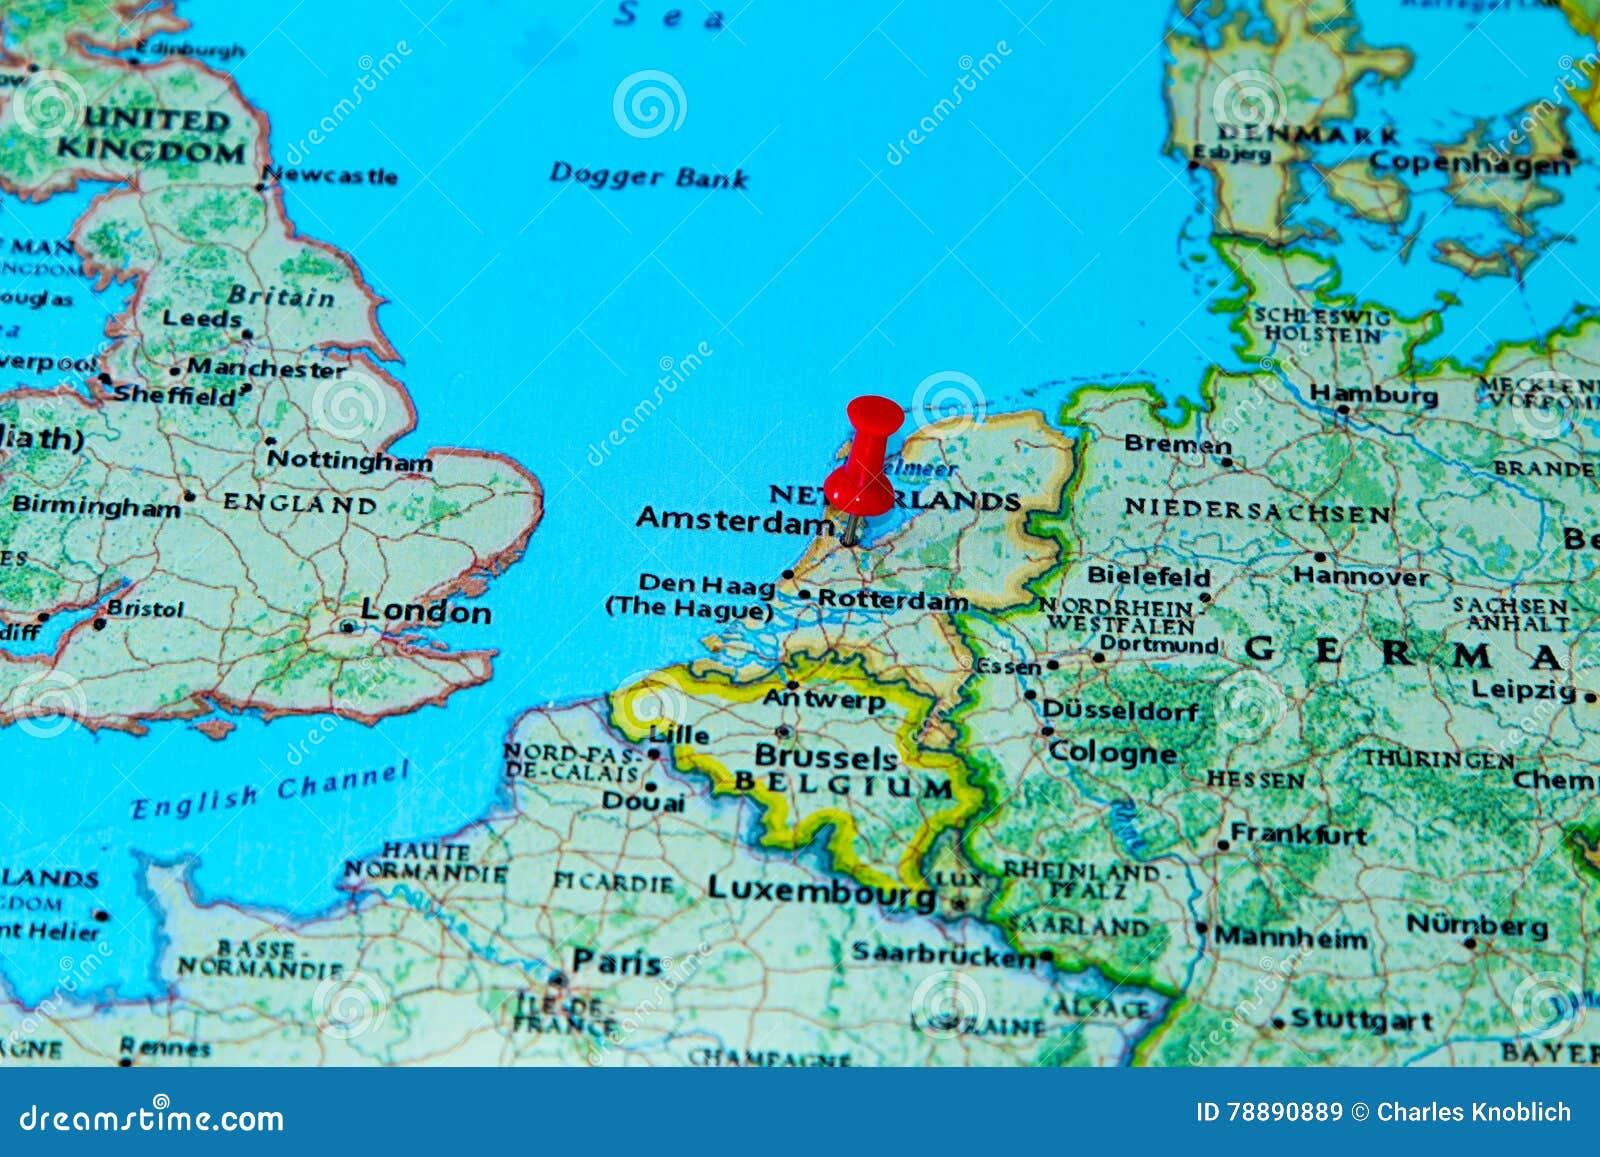 amsterdam mapa europa Amsterdam, Países Bajos Fijó En Un Mapa De Europa Imagen de  amsterdam mapa europa